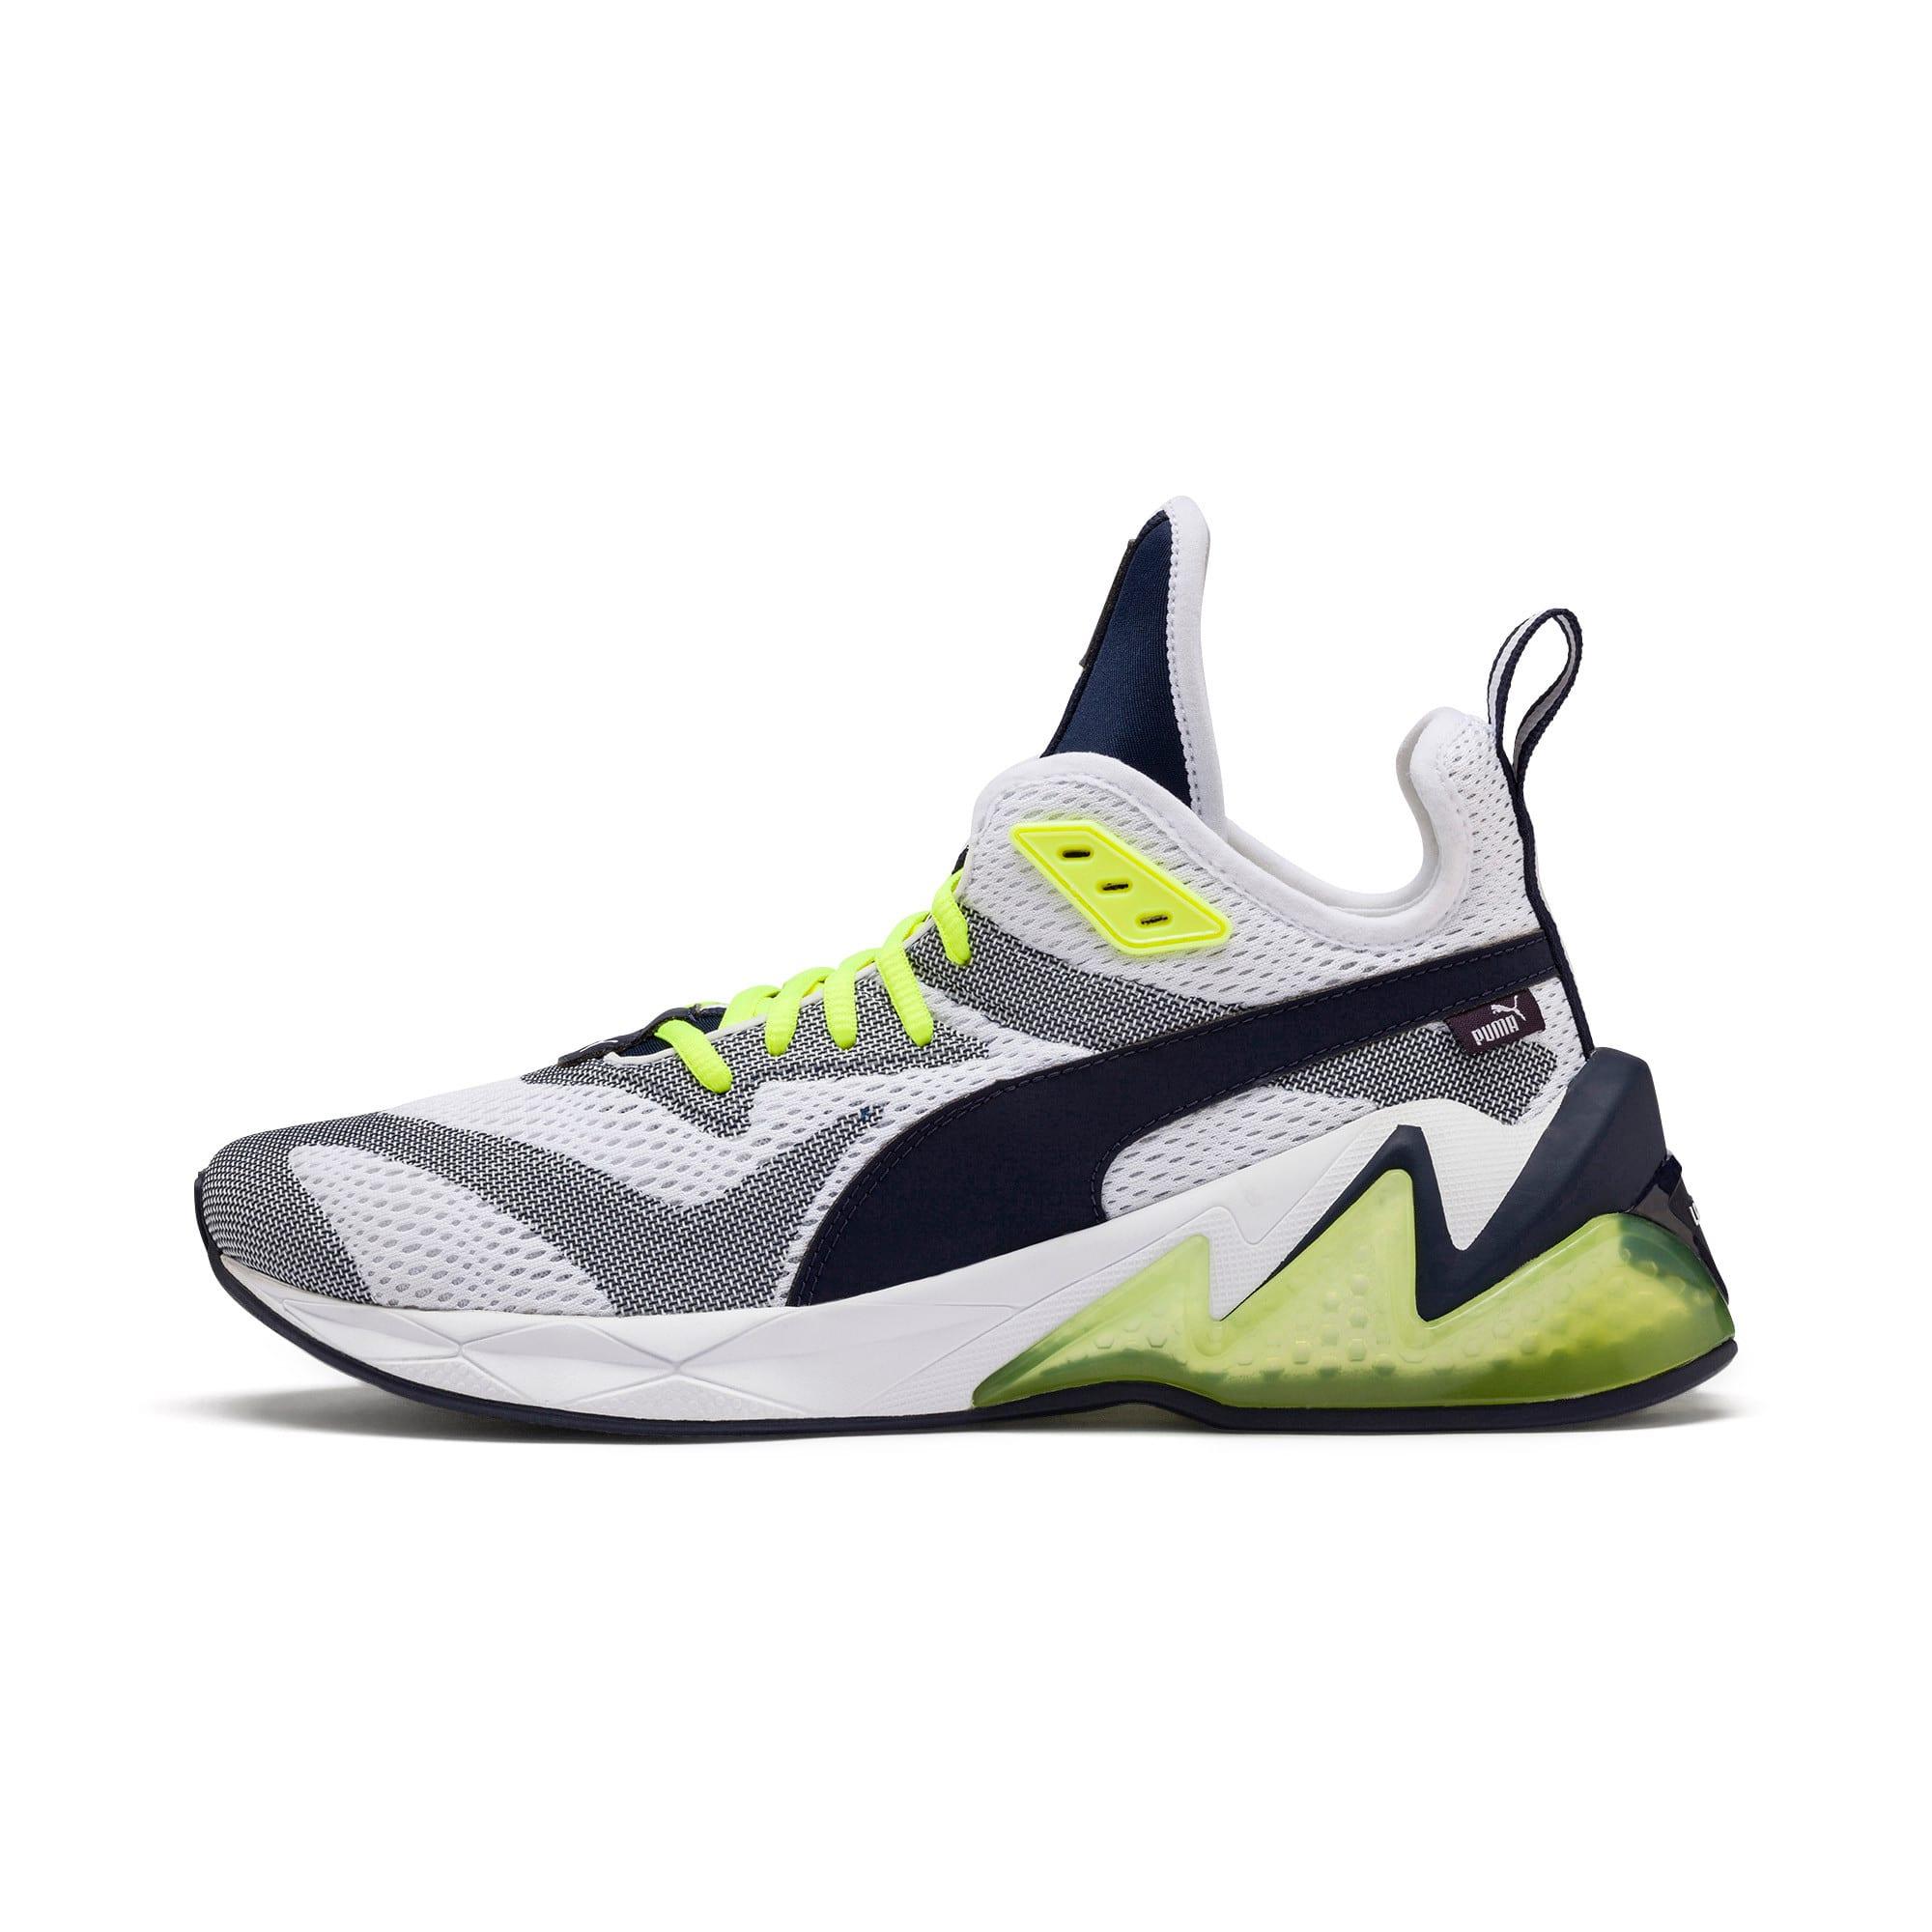 Thumbnail 1 of LQDCELL Origin Tech Men's Shoes, Puma White-Peacoat, medium